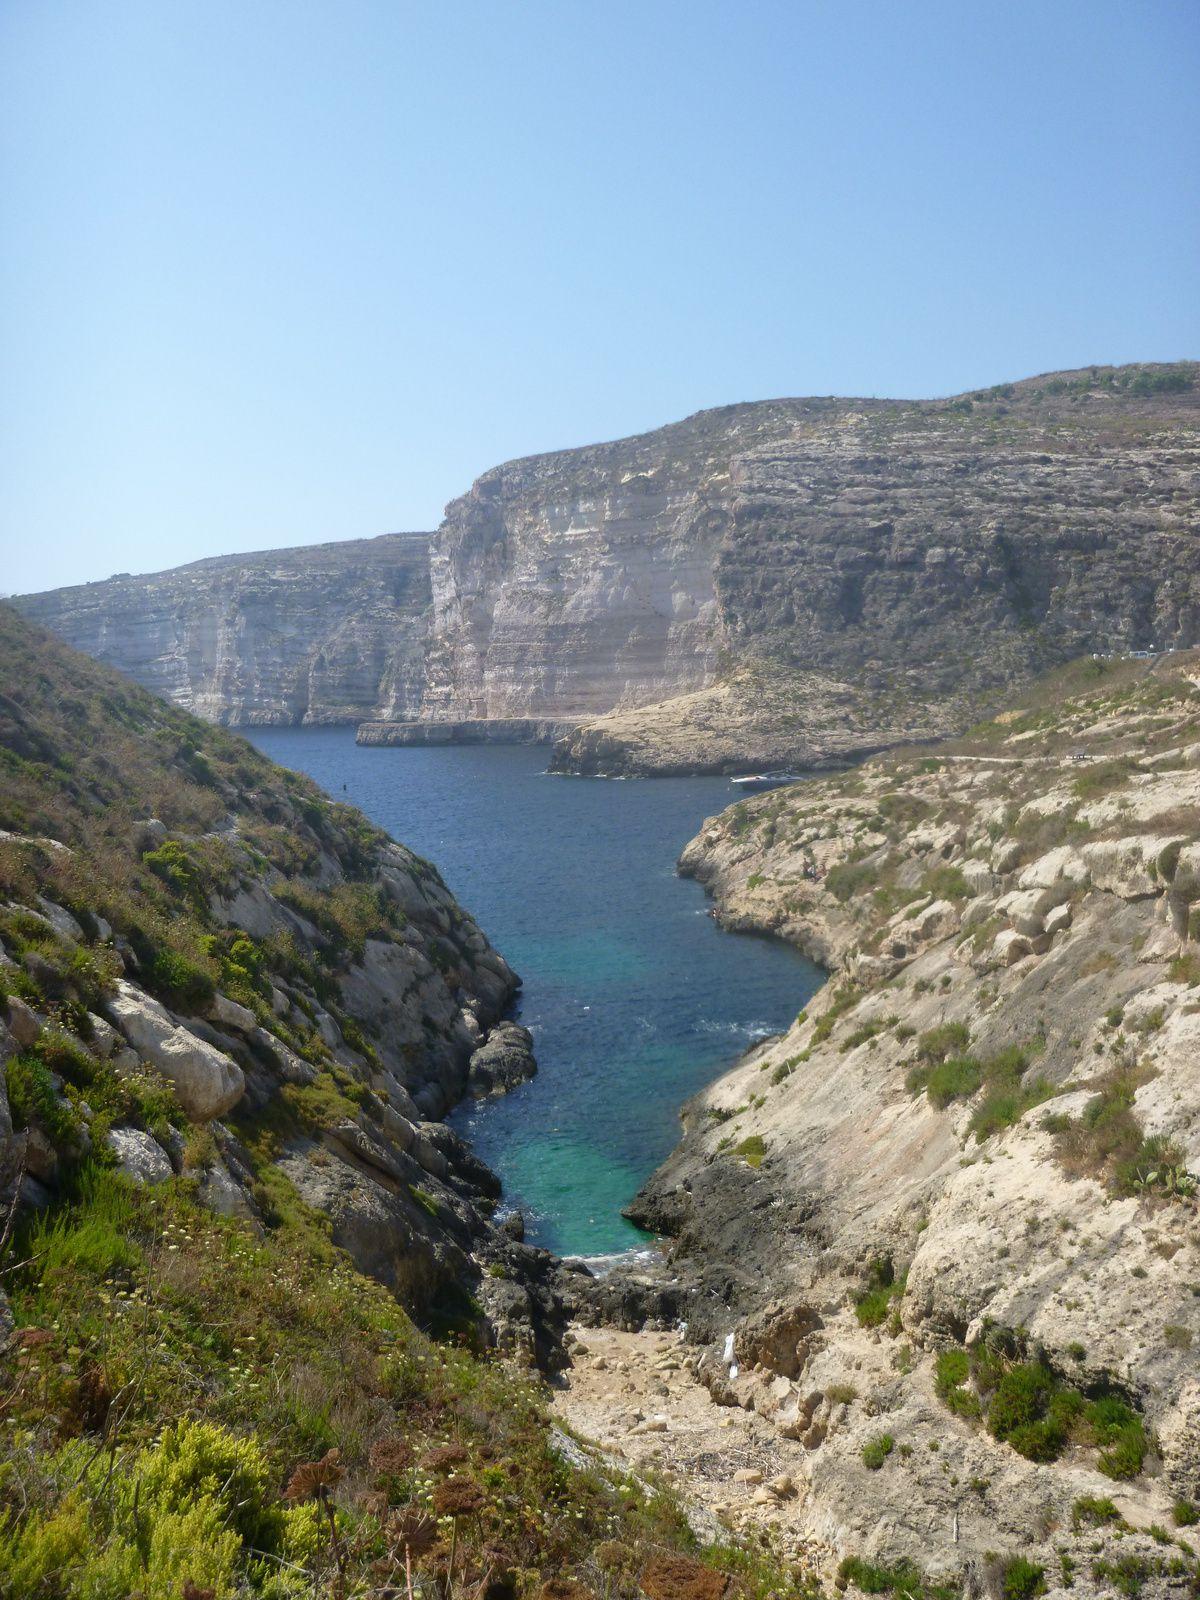 1-Pretty Bay 2-Marsaxlokk 3-village de Popeye 4-Xendi,Gozo 5-Azure Window,Gozo 6-Blue Lagoon,Comino 7-Mdina 8et 9- La Vallette